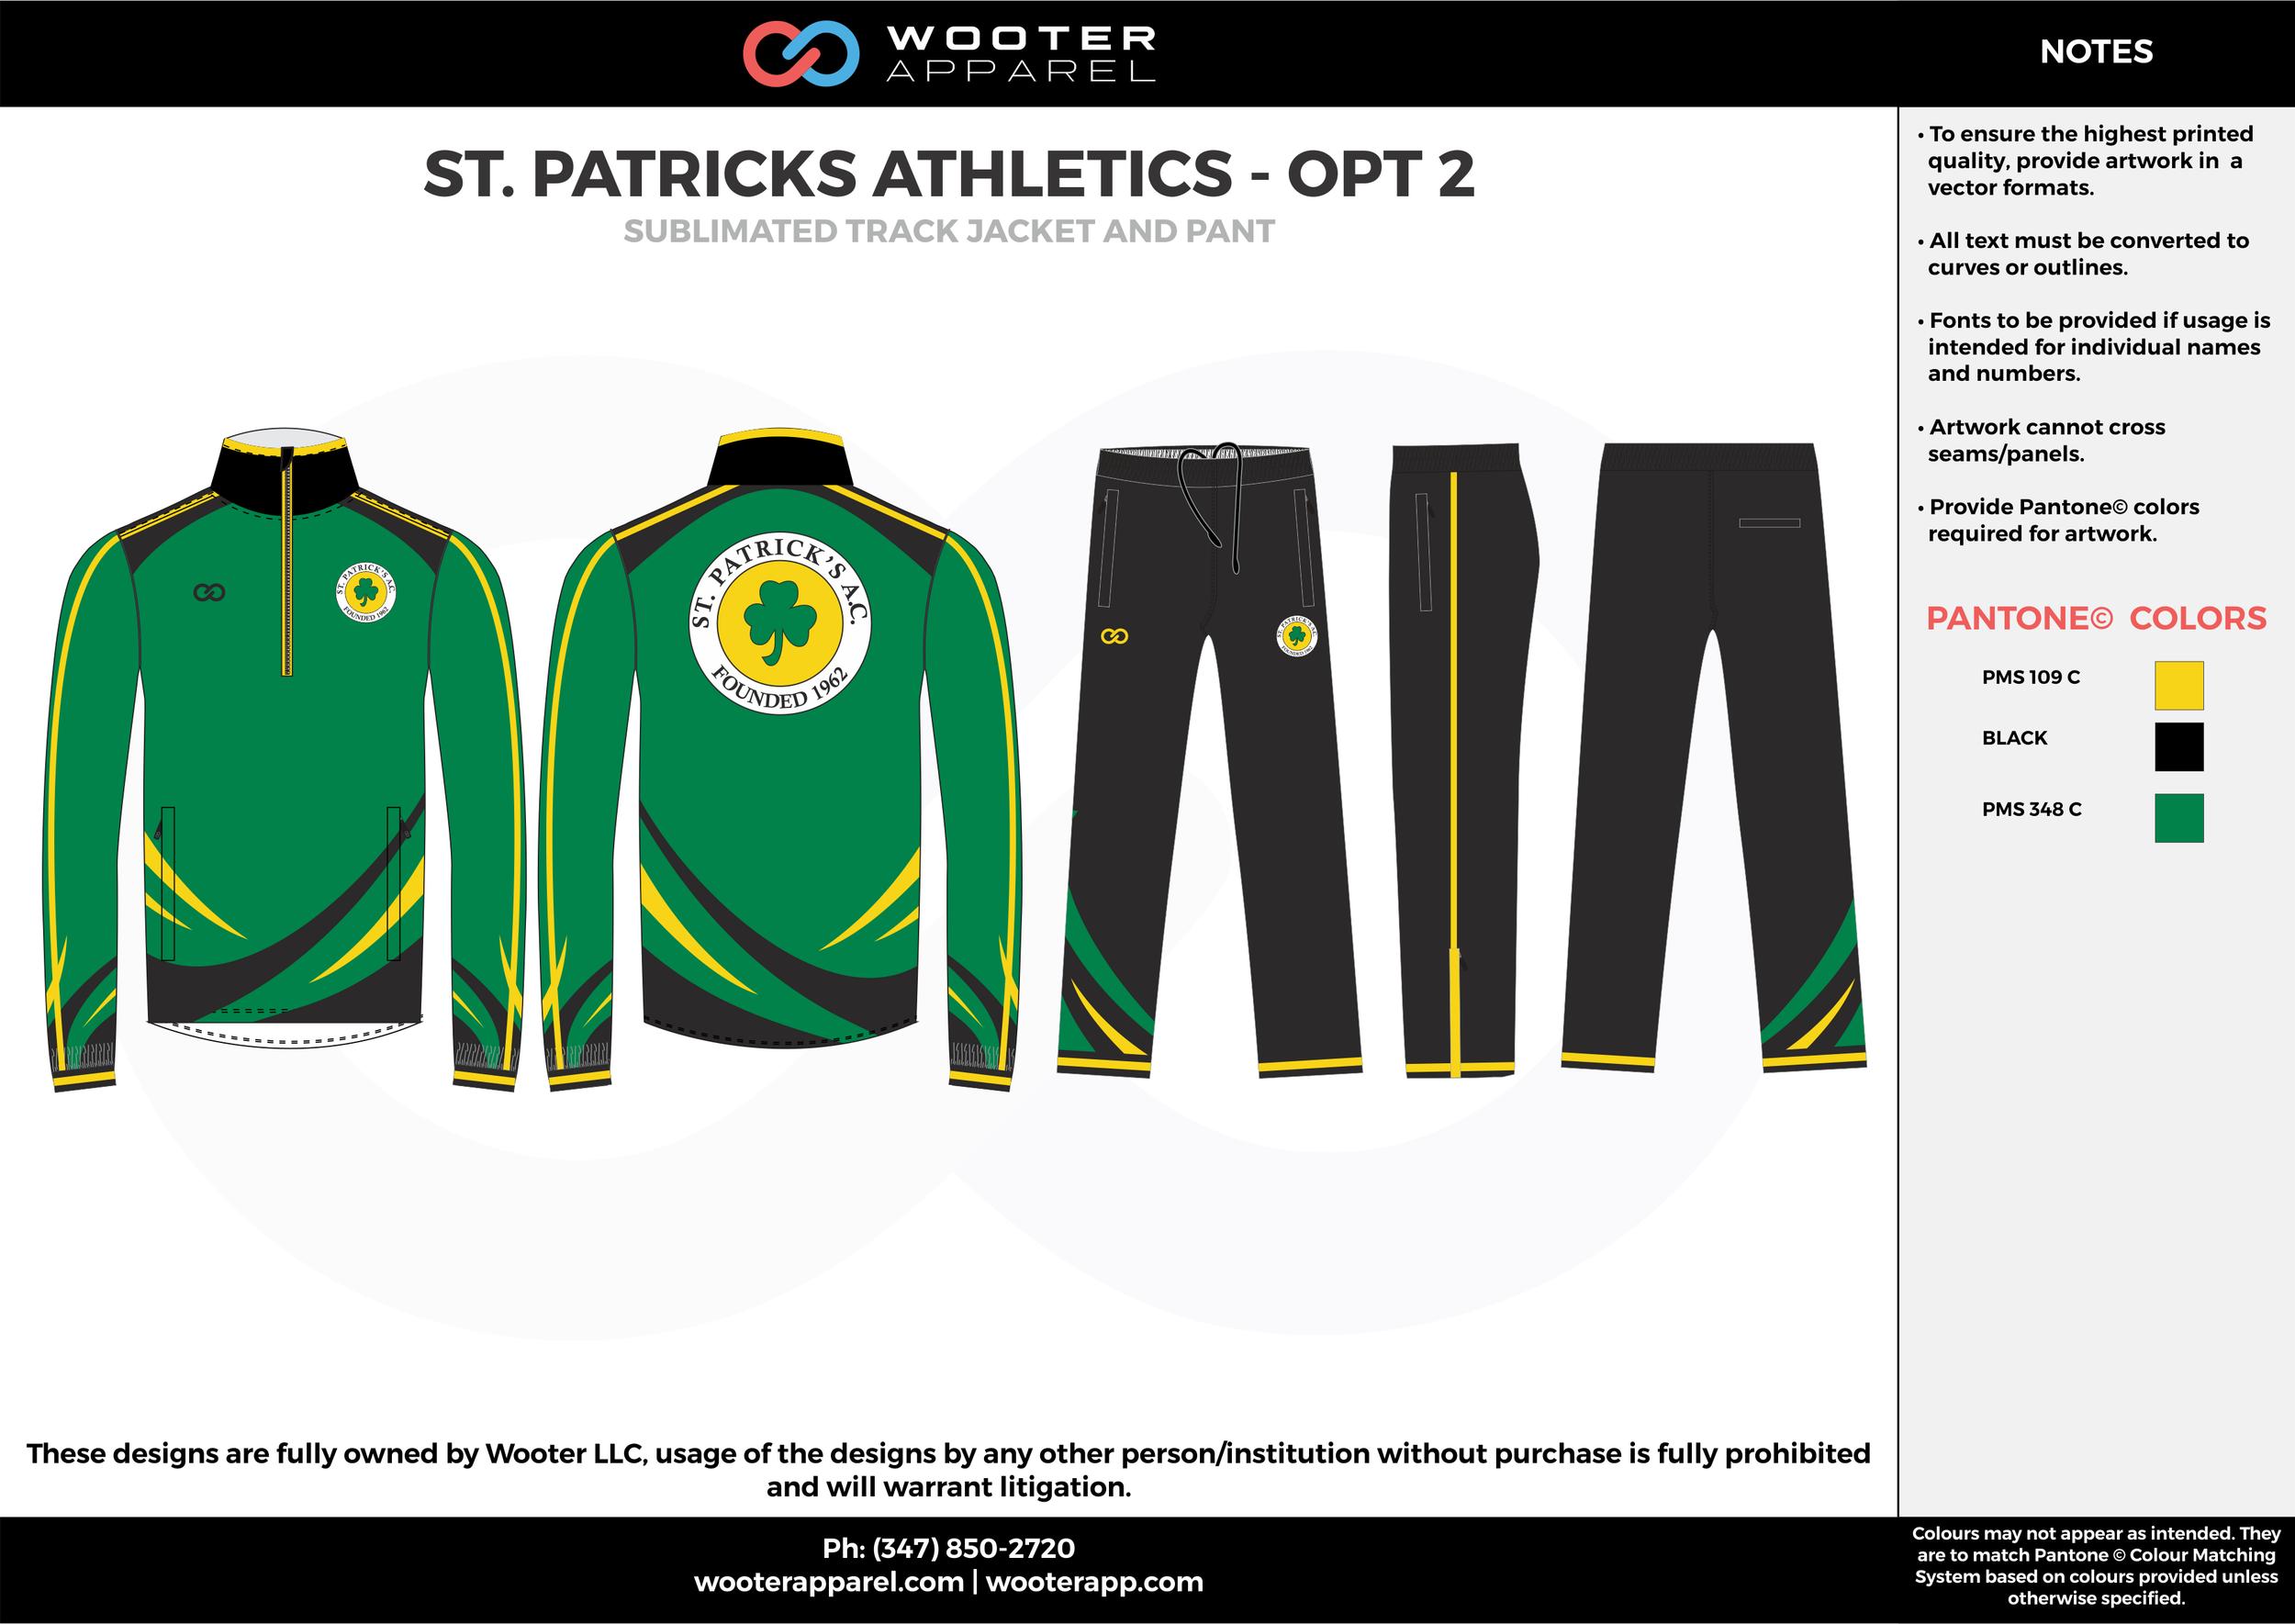 ST. PATRICKS ATHLETICS - OPT 2 green yellow black  Track Jacket, Track Pants, Tracksuit, Warmup Suit